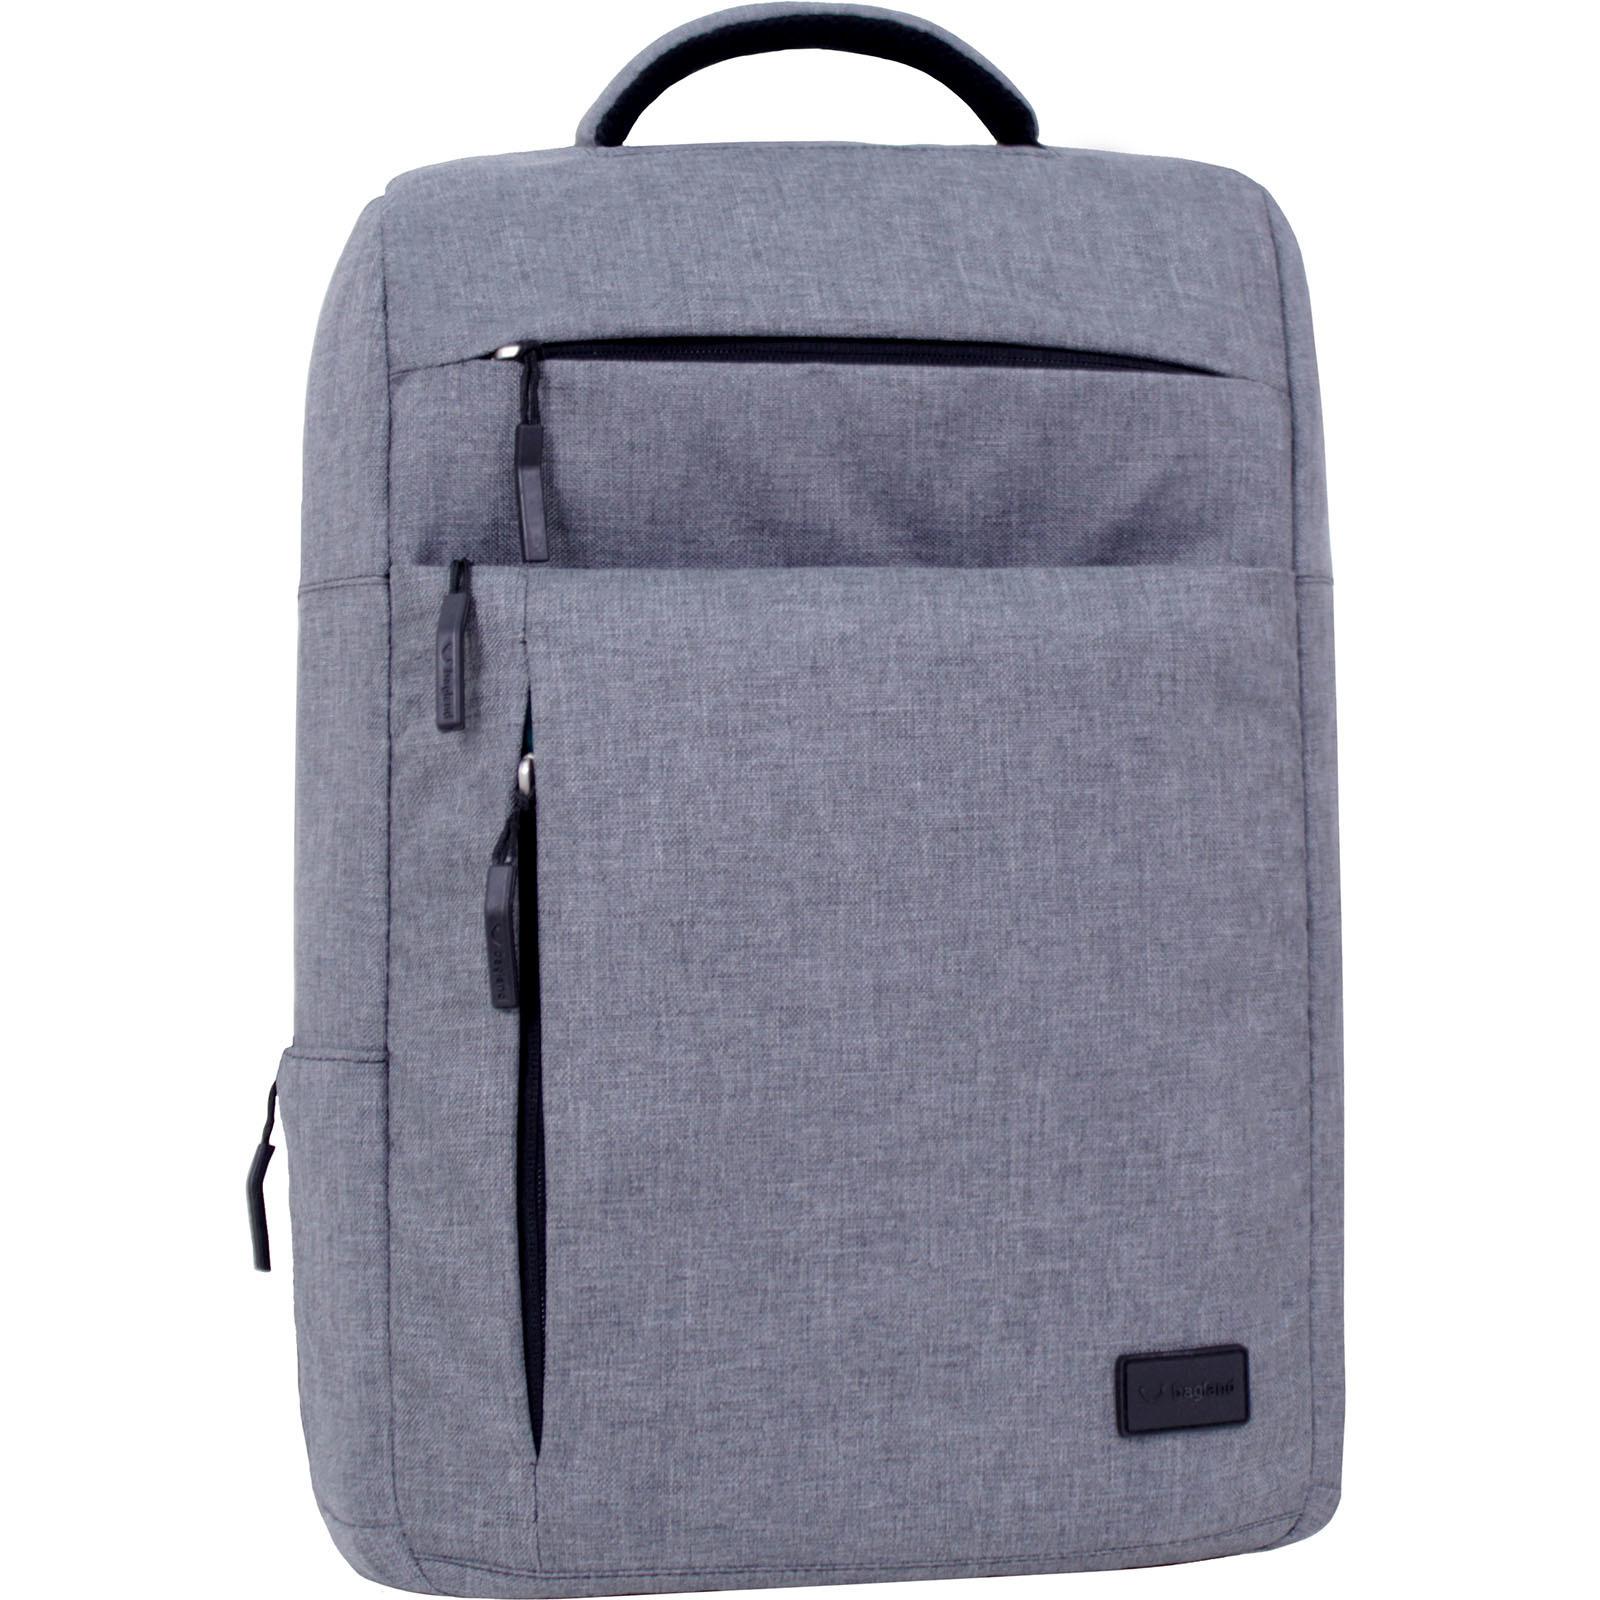 Городские рюкзаки Рюкзак Bagland Волнорез 20 л. серый (0013869) IMG_2635.JPG